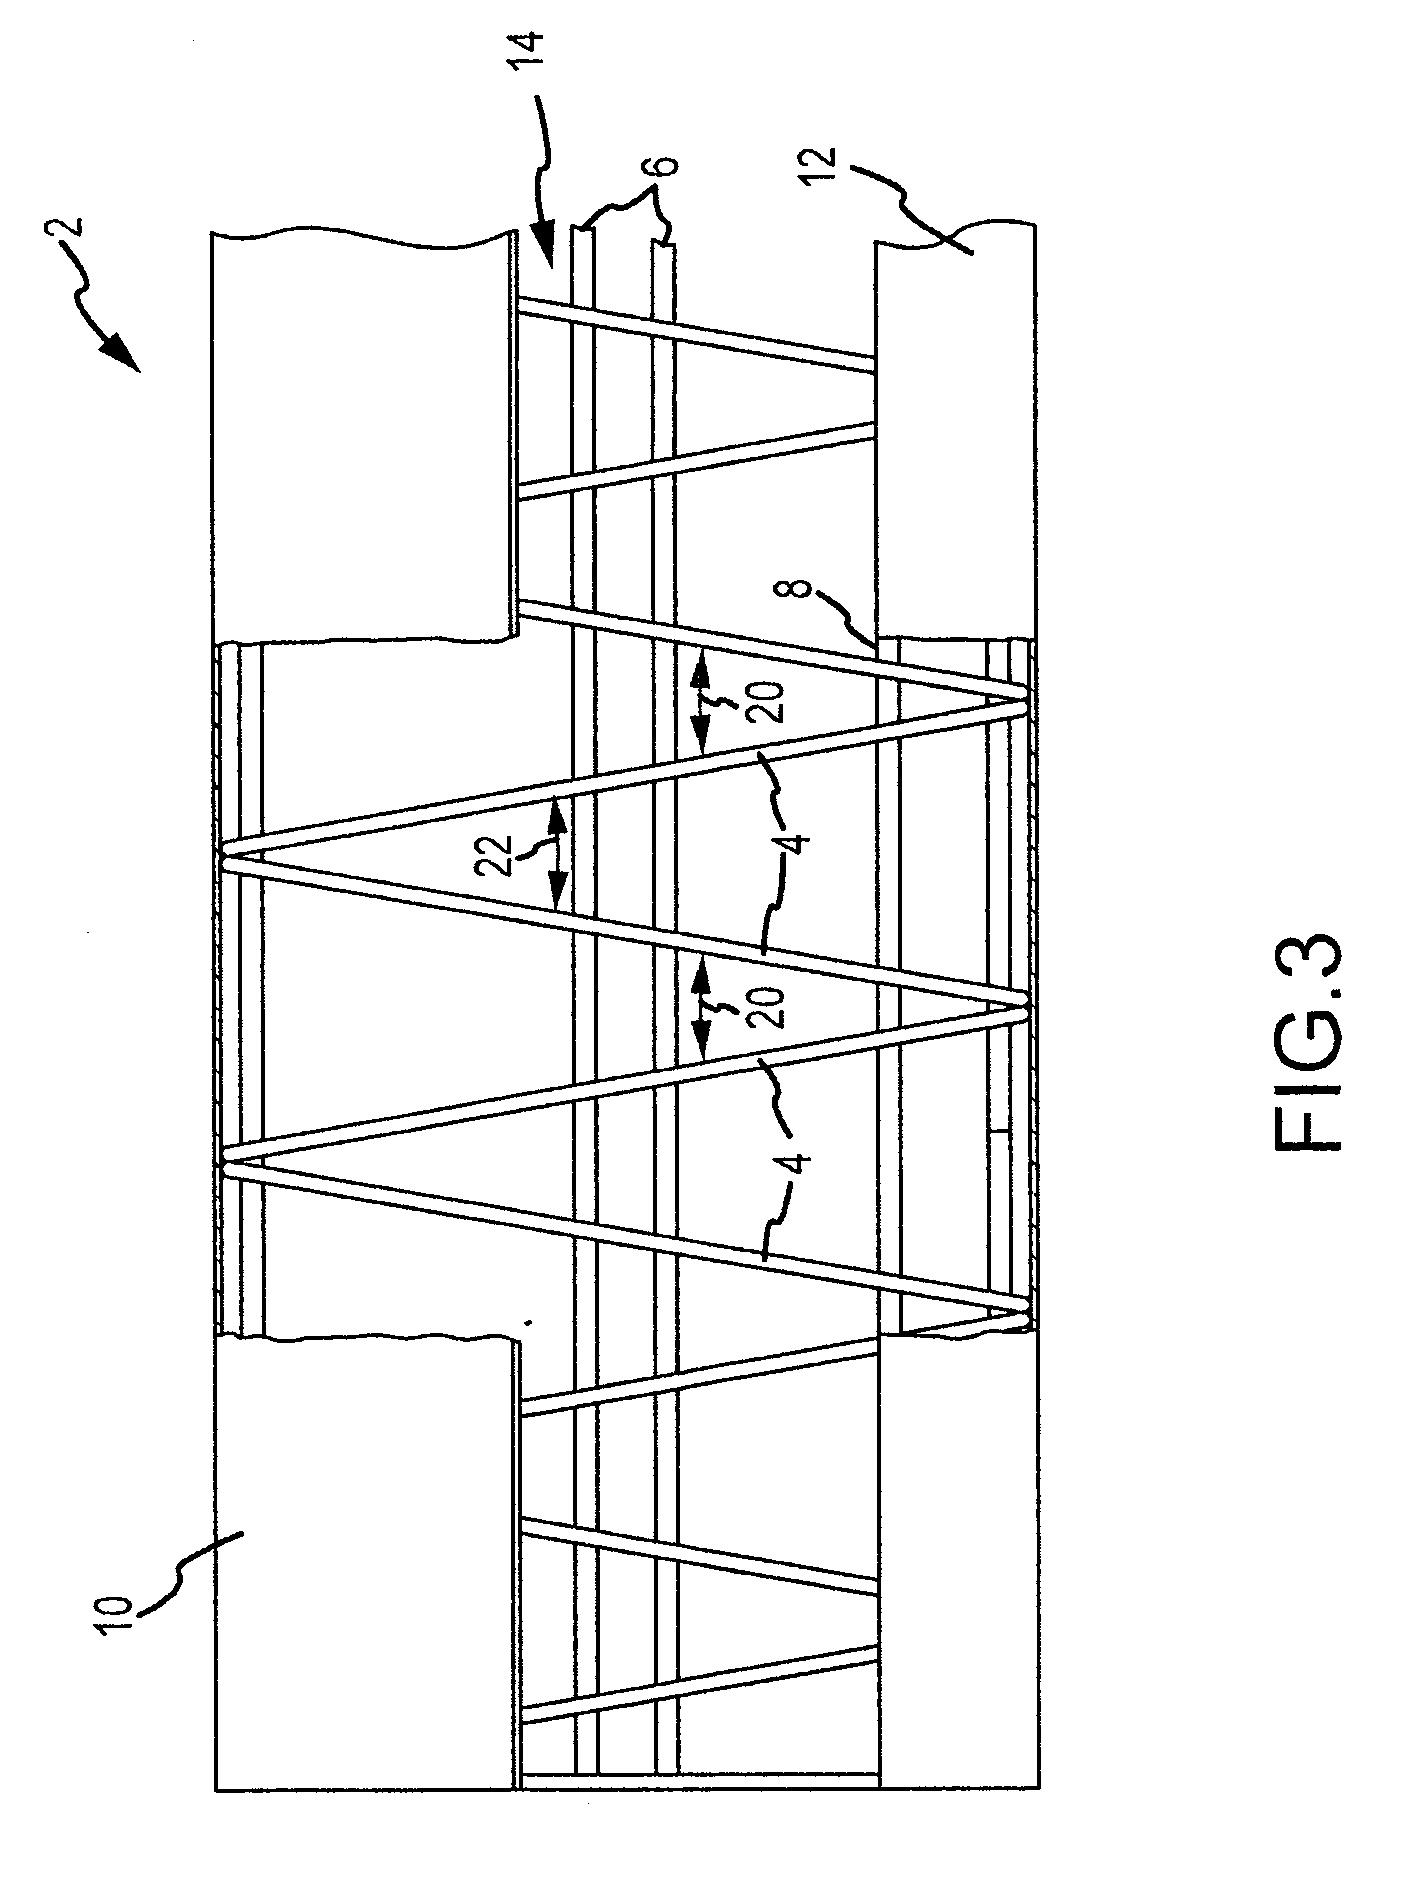 Parallel Chord Truss Overhangs | Wiring Diagram Database